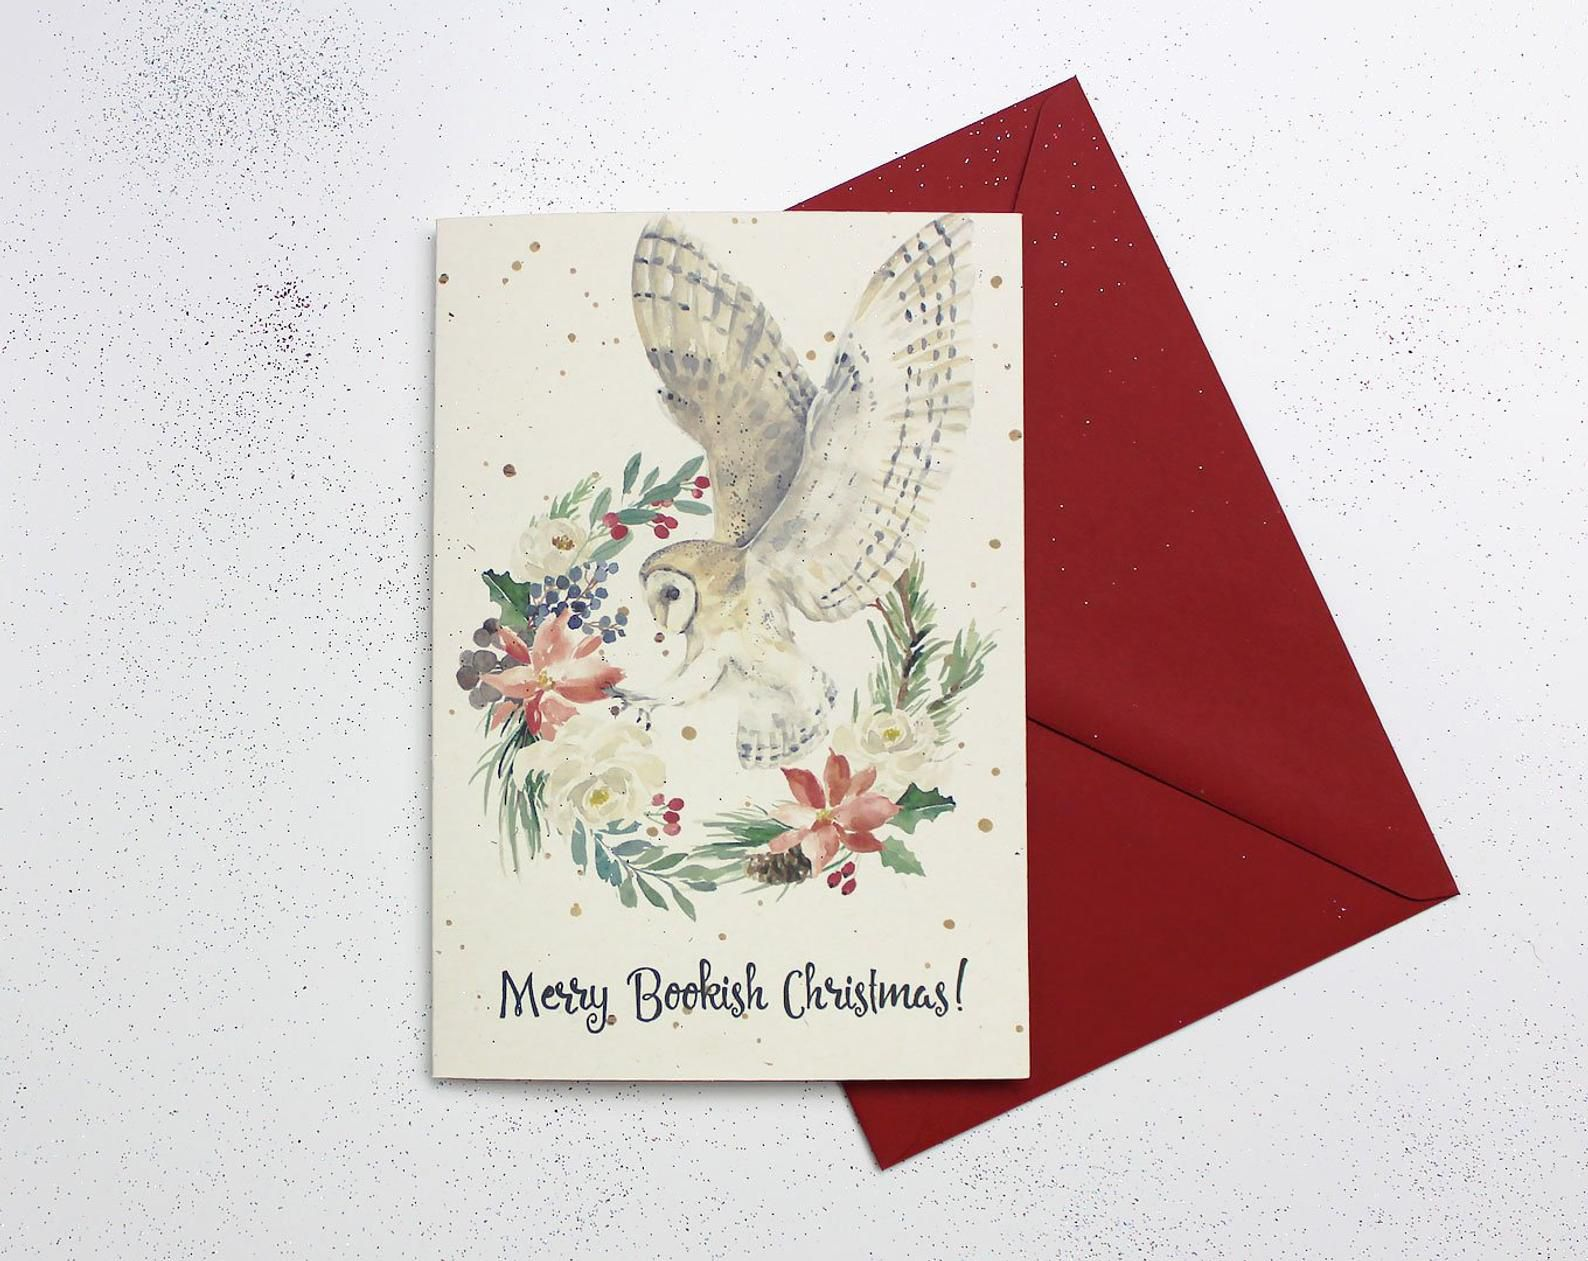 Merry Bookish Christmas Card